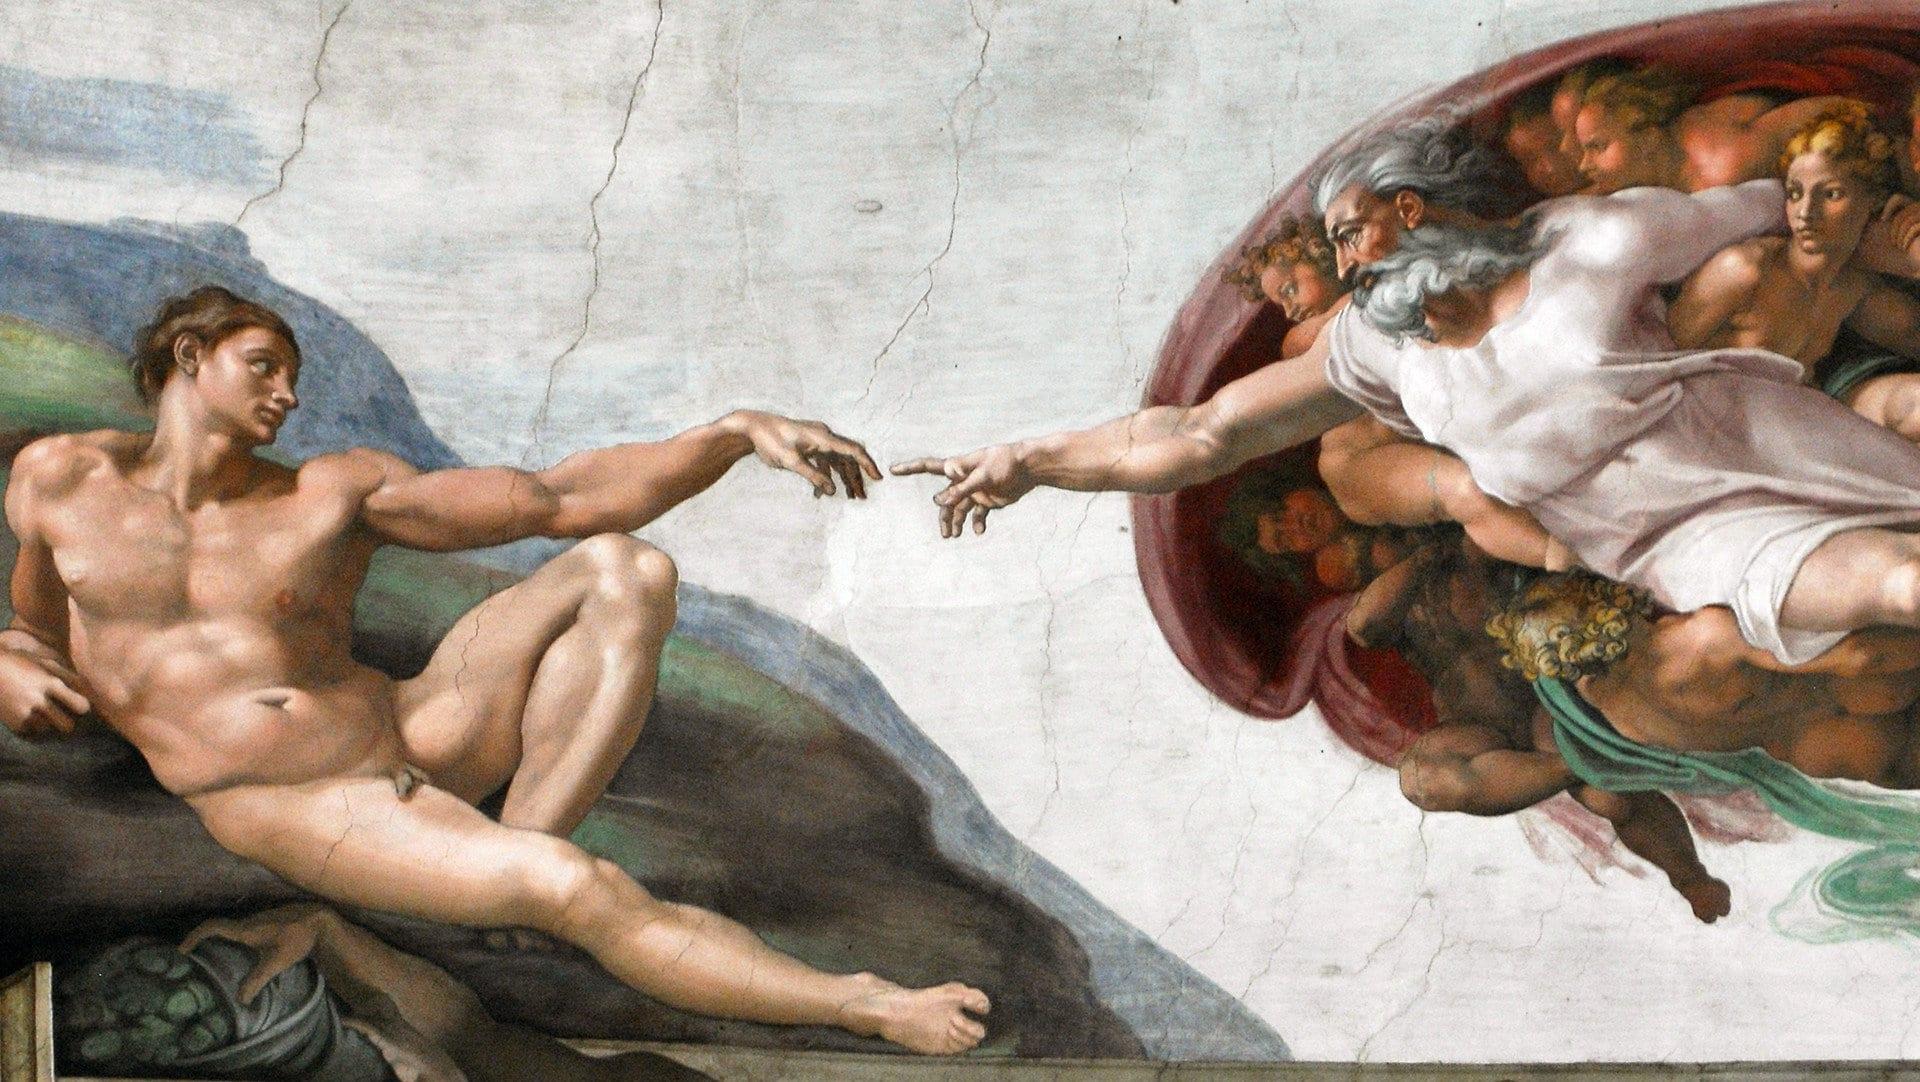 Canapa e arte